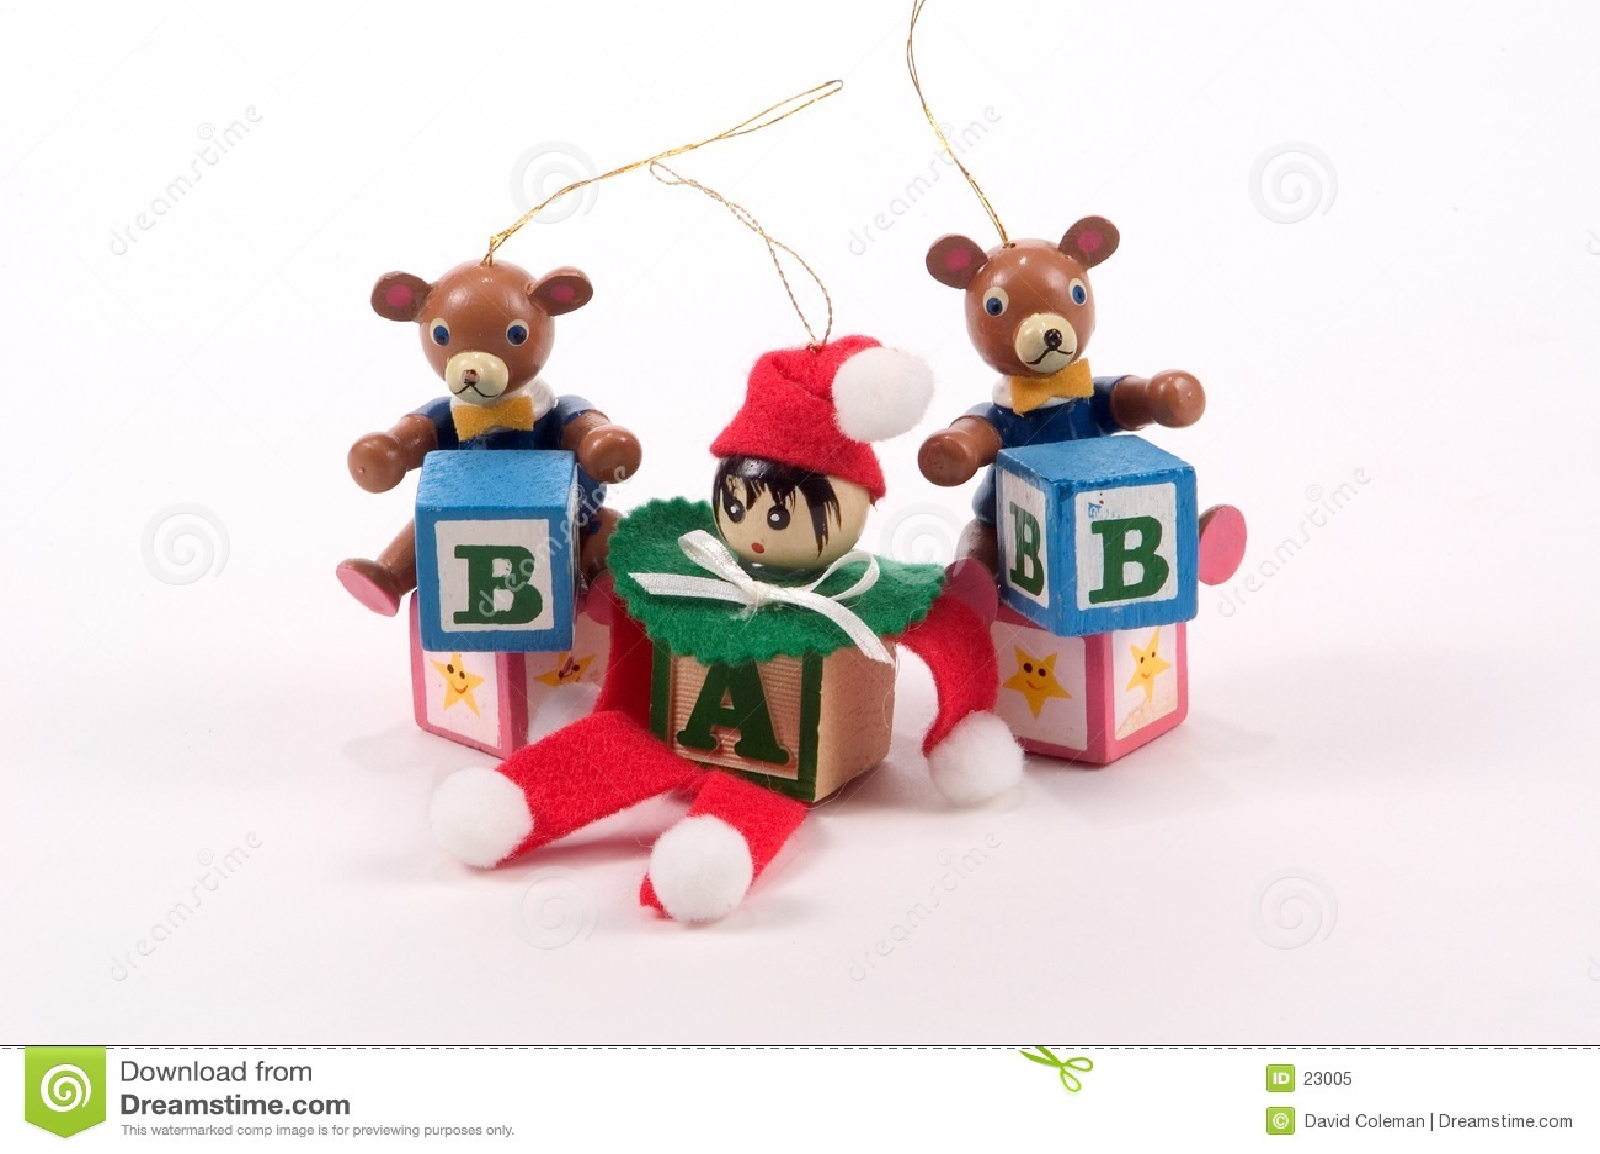 Alphabet Block Tree Ornaments